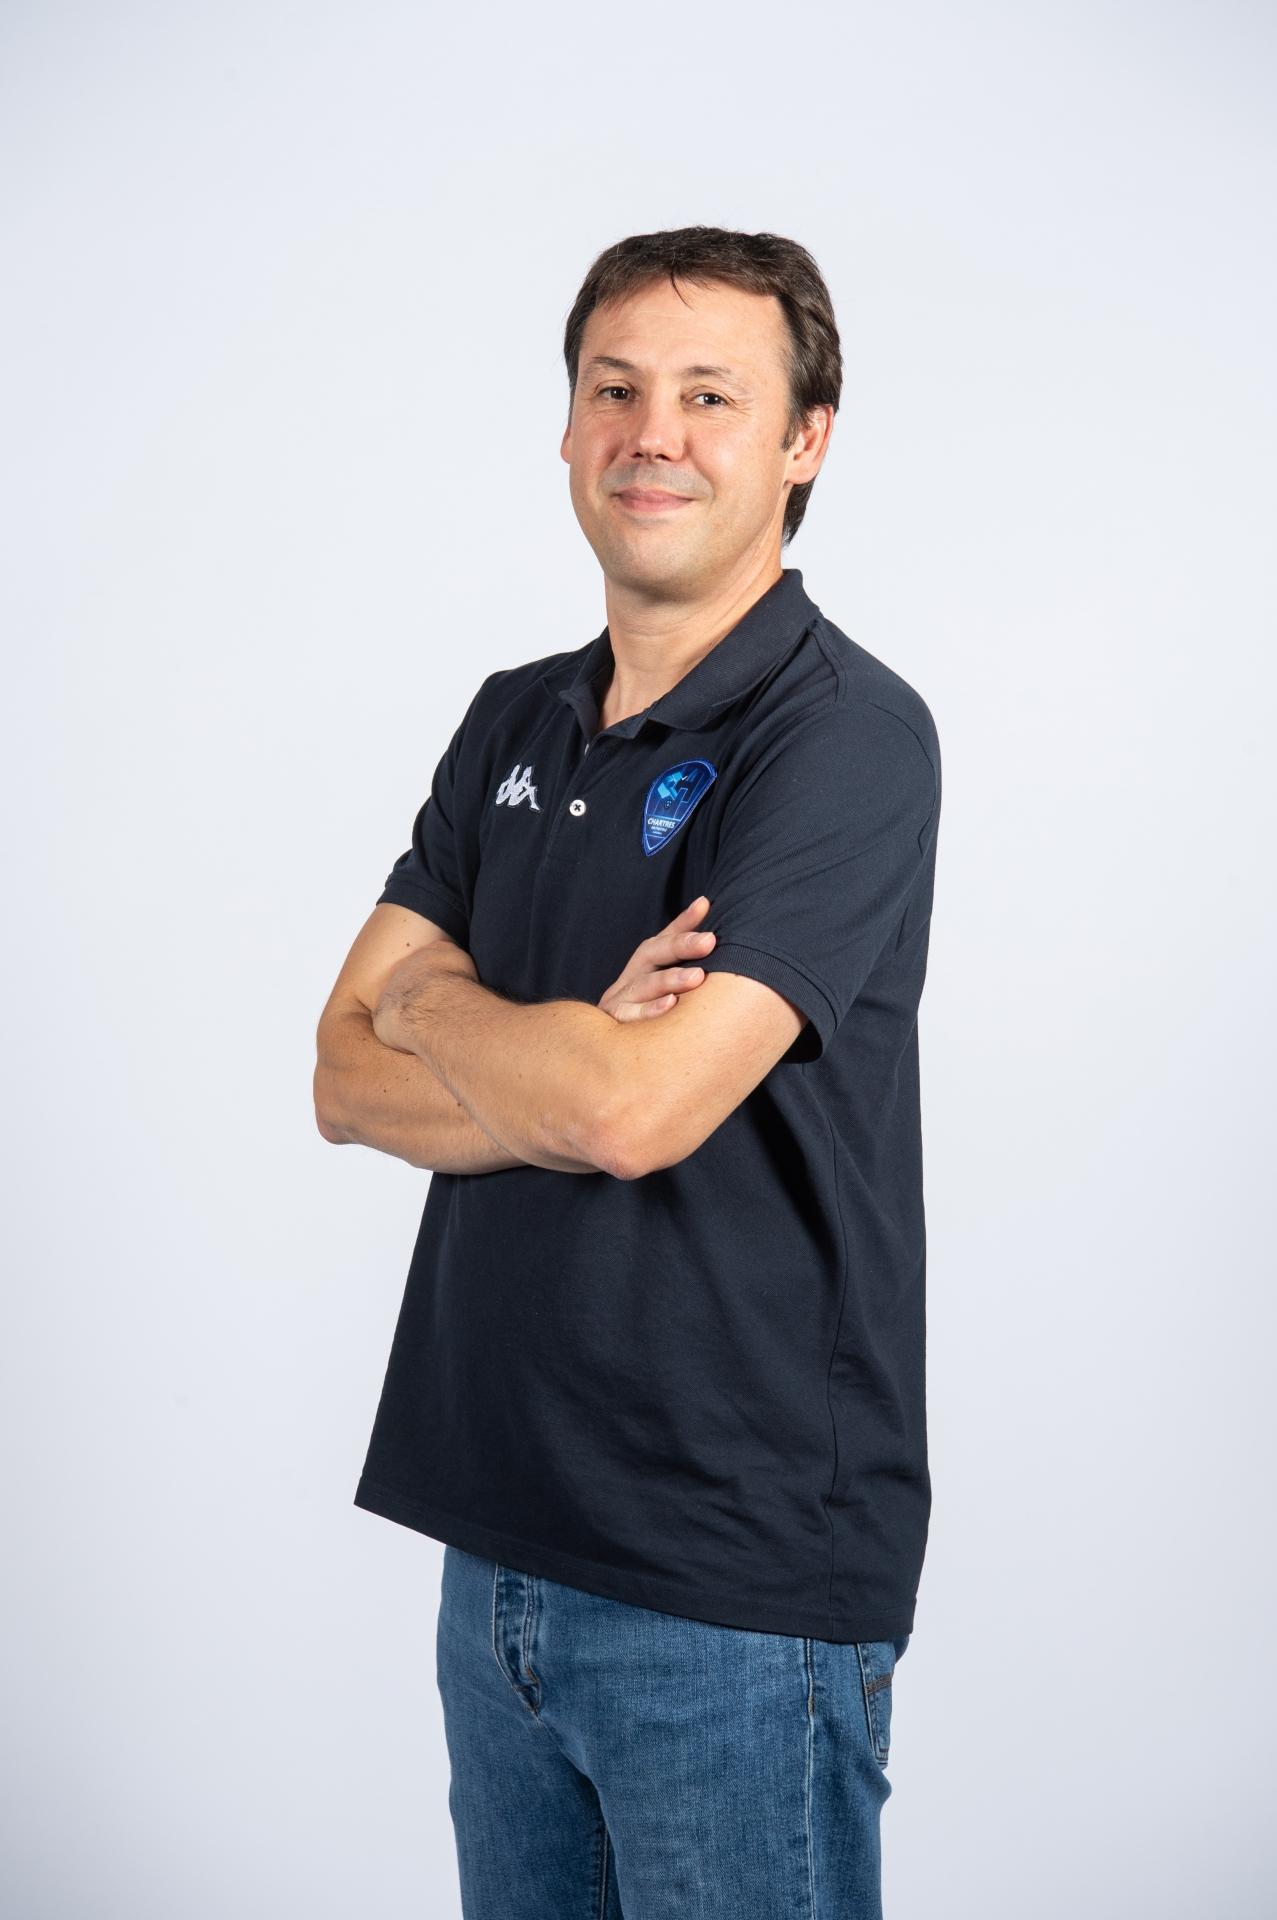 Jérôme DELARUE